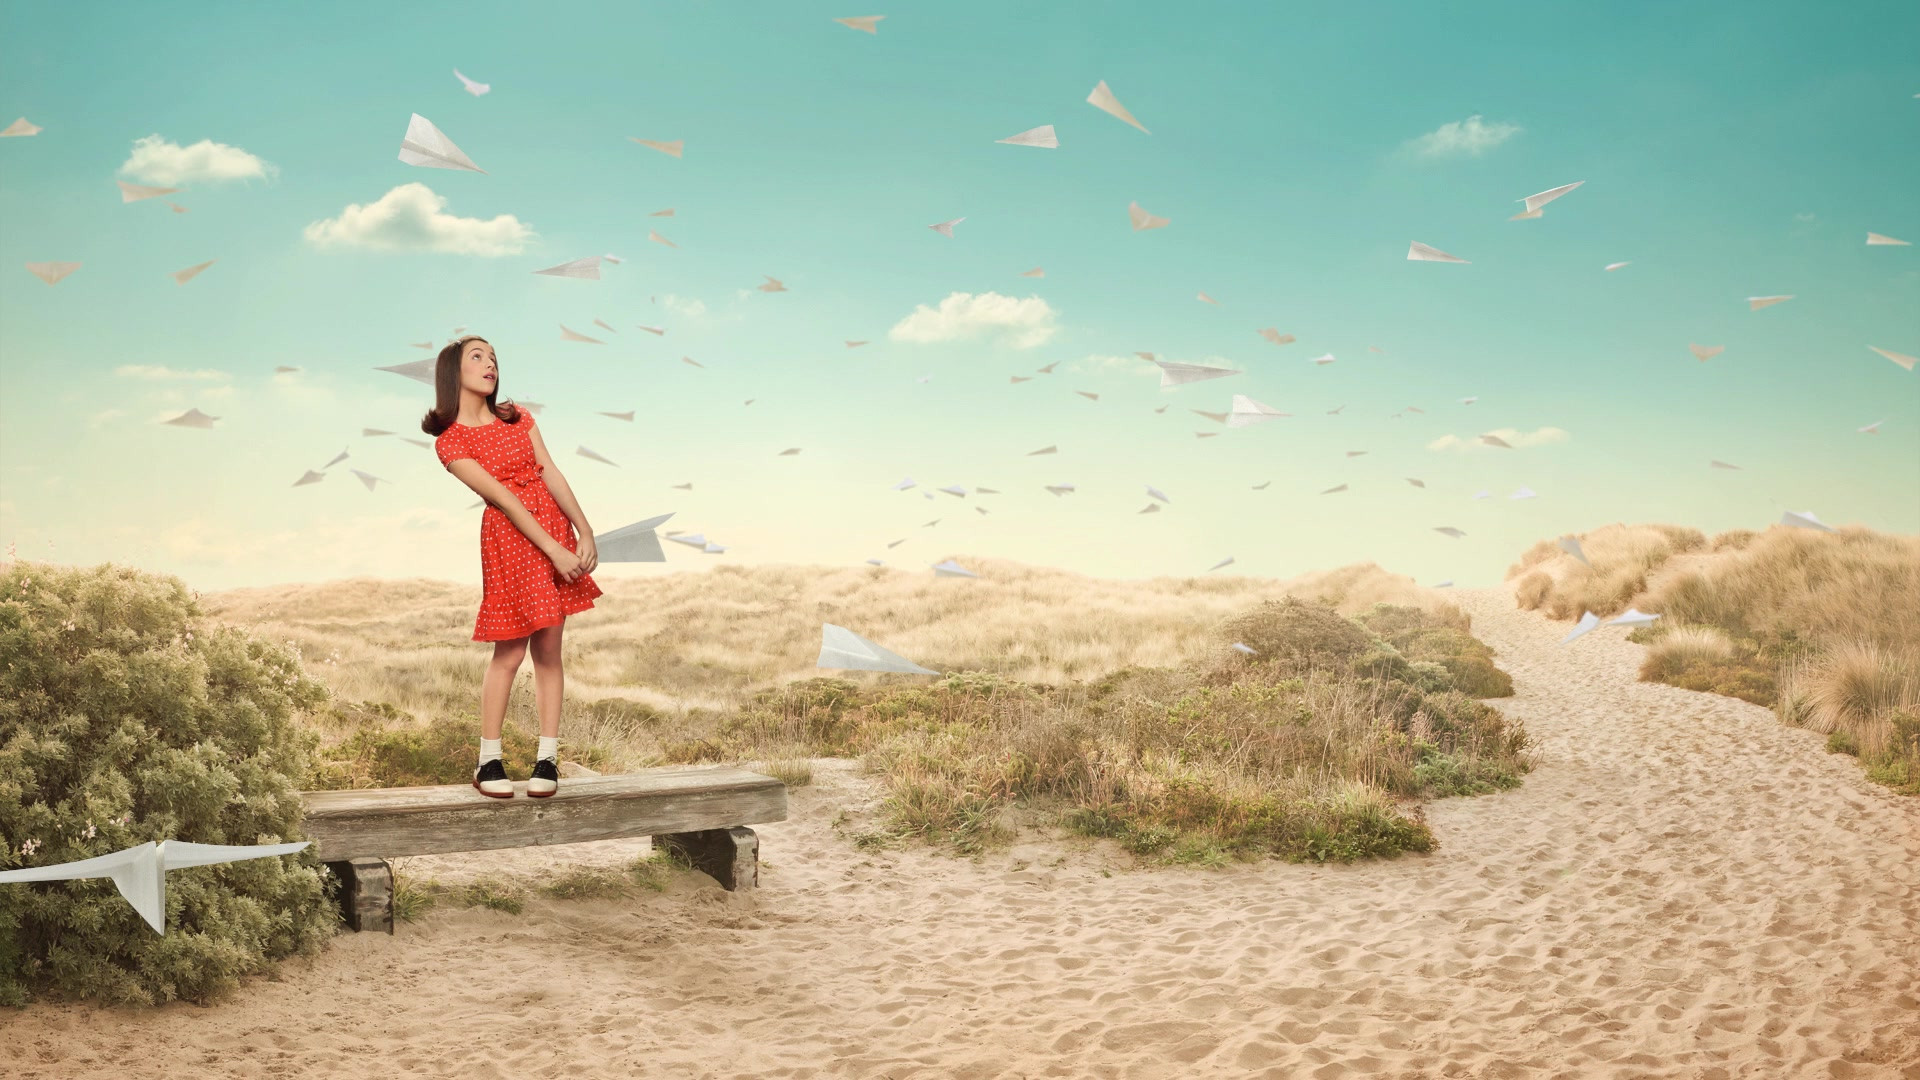 Chris Crisman - Paperplanes